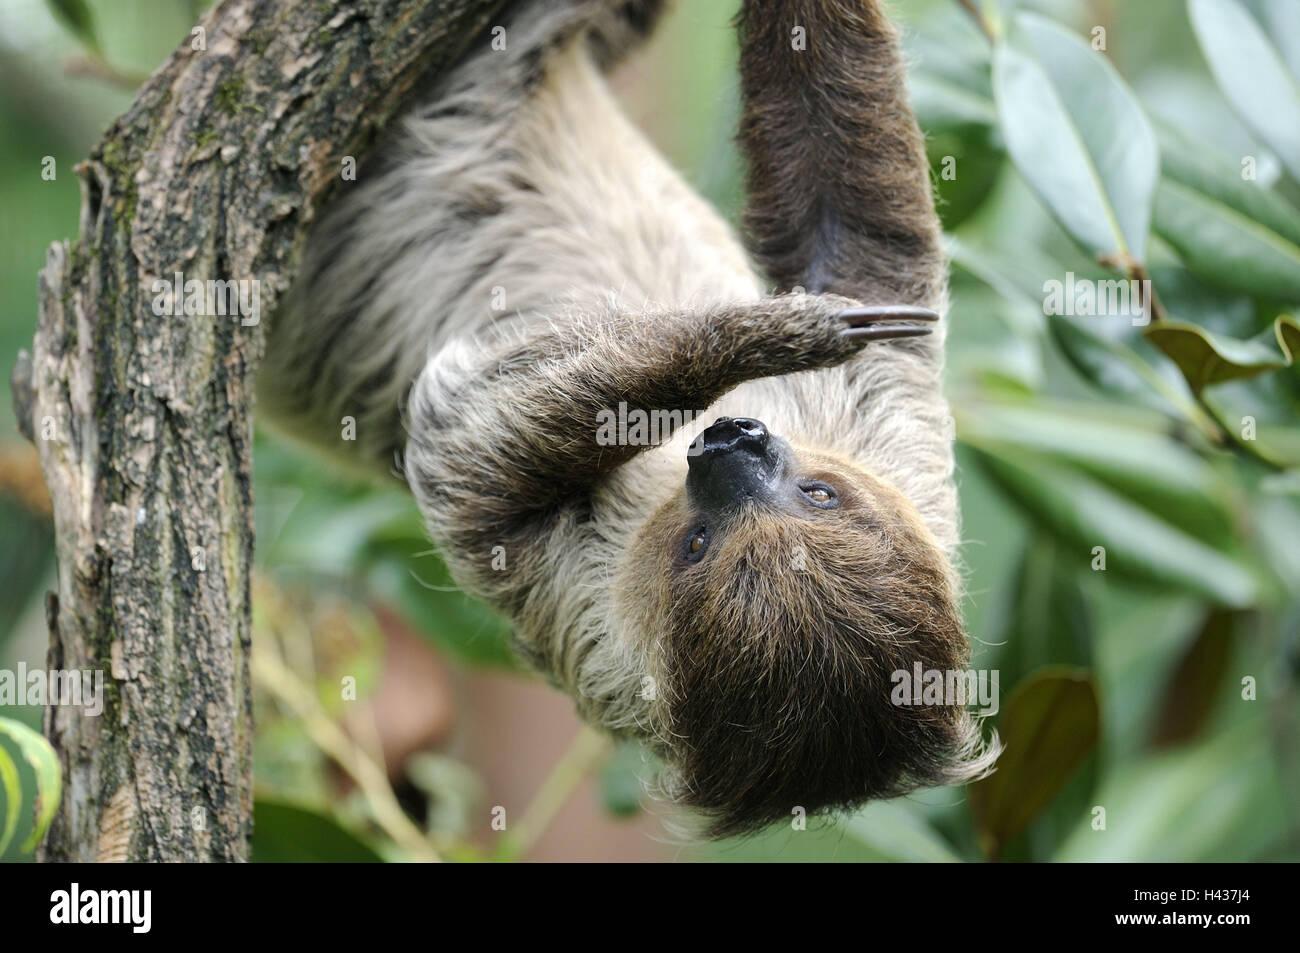 2 finger-Faultier, Choloepus Didactylus, Zweig, hängen, kopfüber, Tier, wildes Tier, Zoo-Tier, Pelz, Säugetier, Stockbild